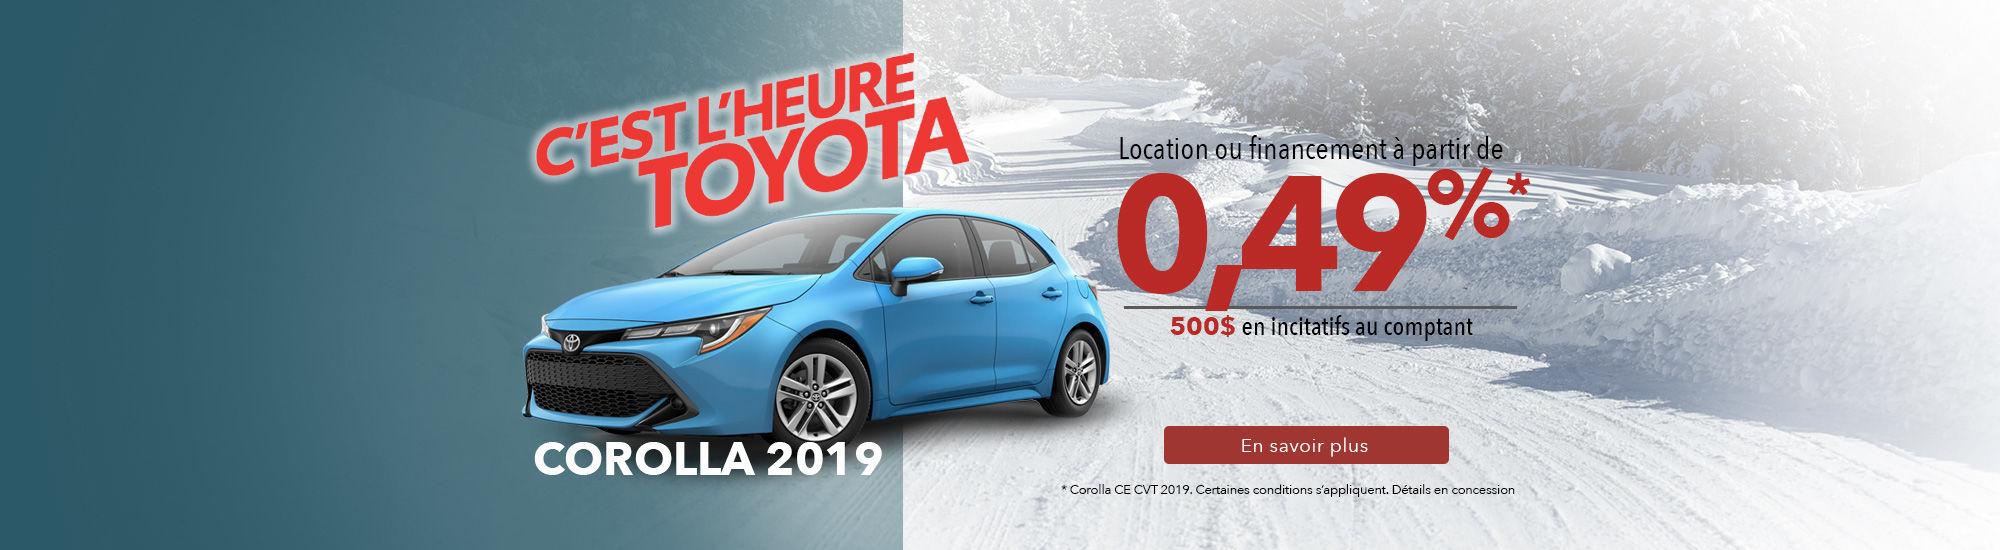 Corolla 2019 - Janvier 2019